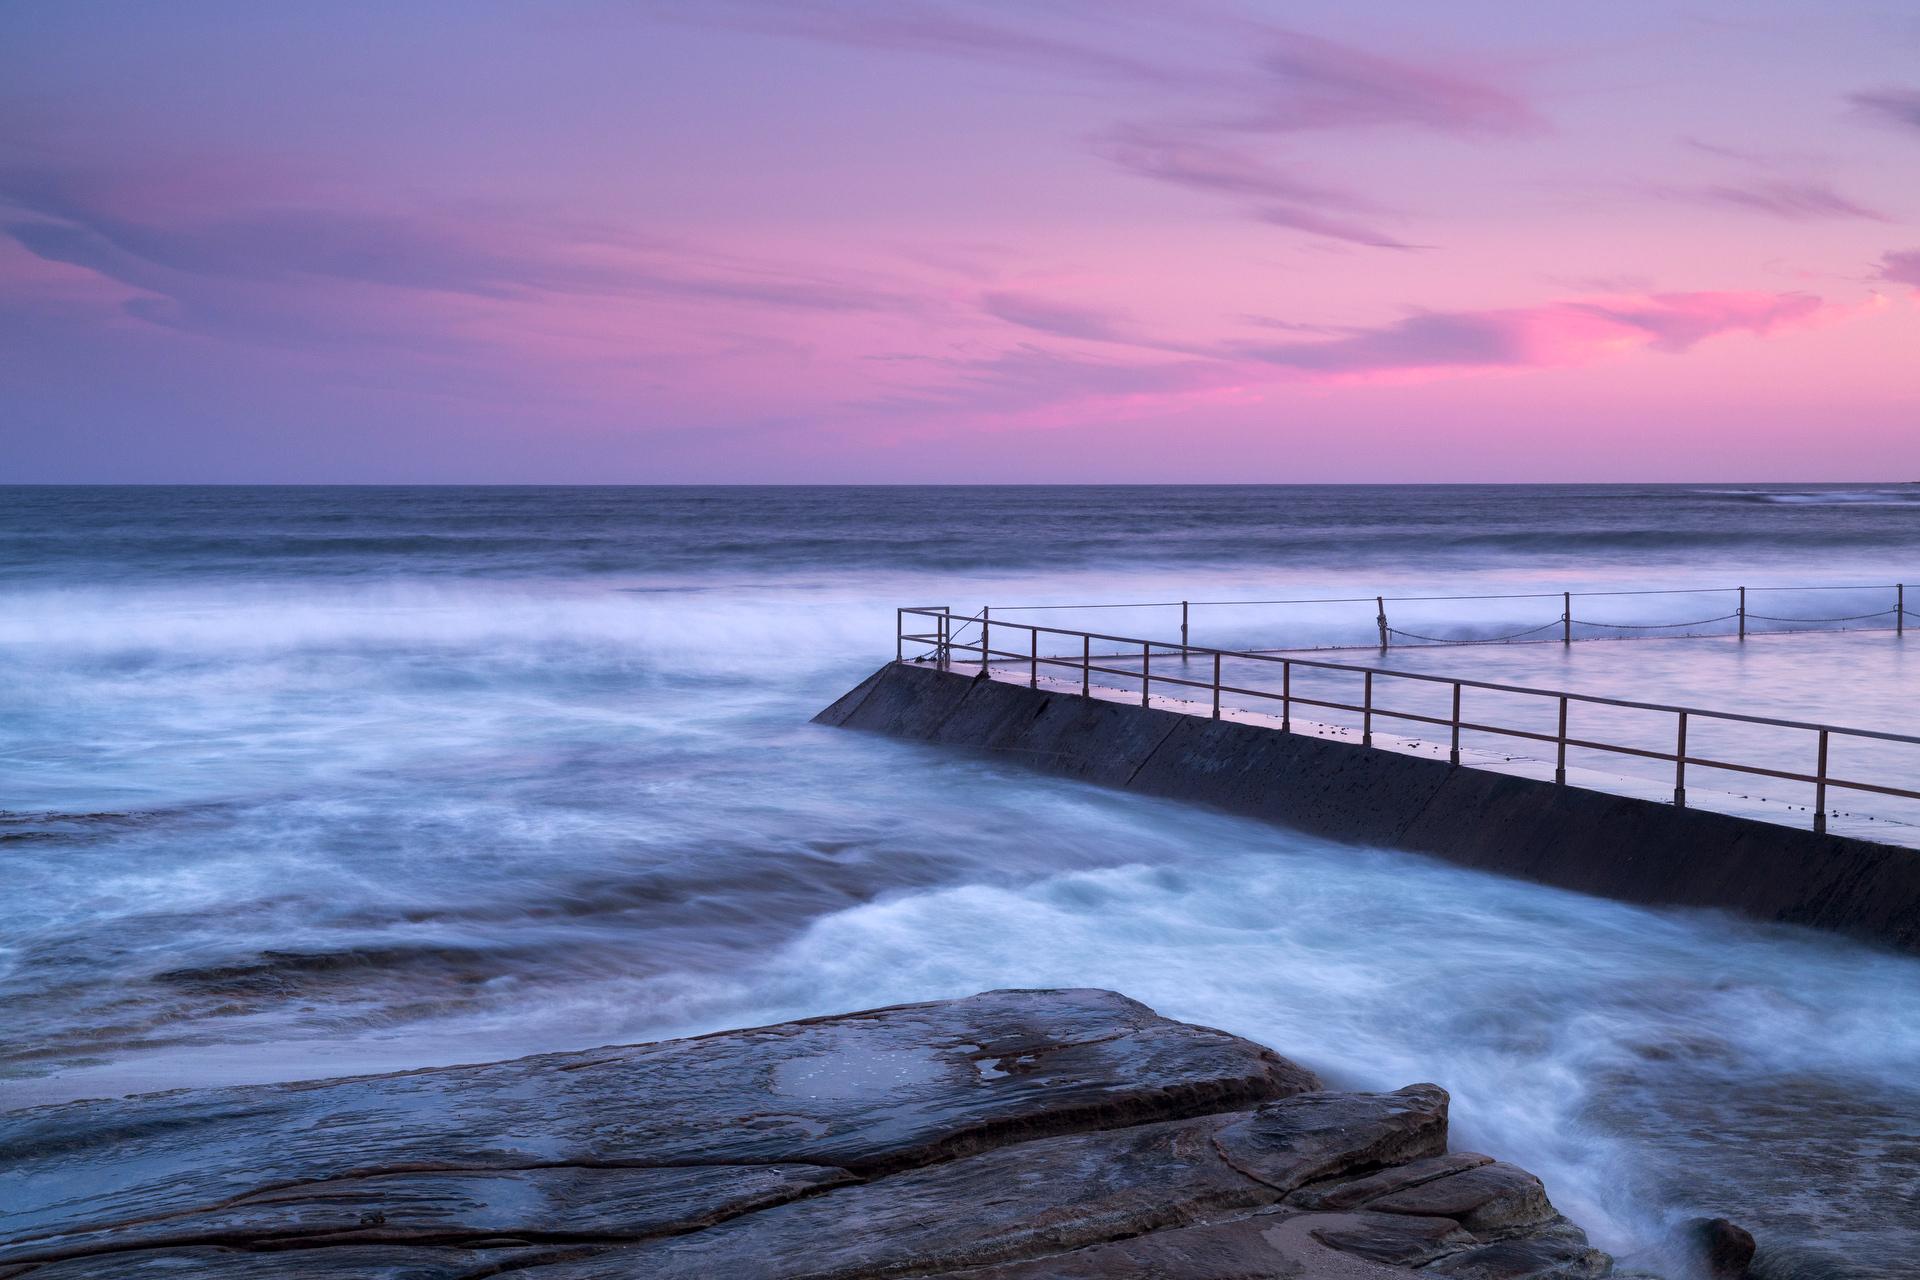 Sydney landscape photographer, sunrise, sunset, ocean, ocean pool, landscape, award winning, travel, NSW, Australia, sea, fine art prints, While you were sleeping, Cronulla